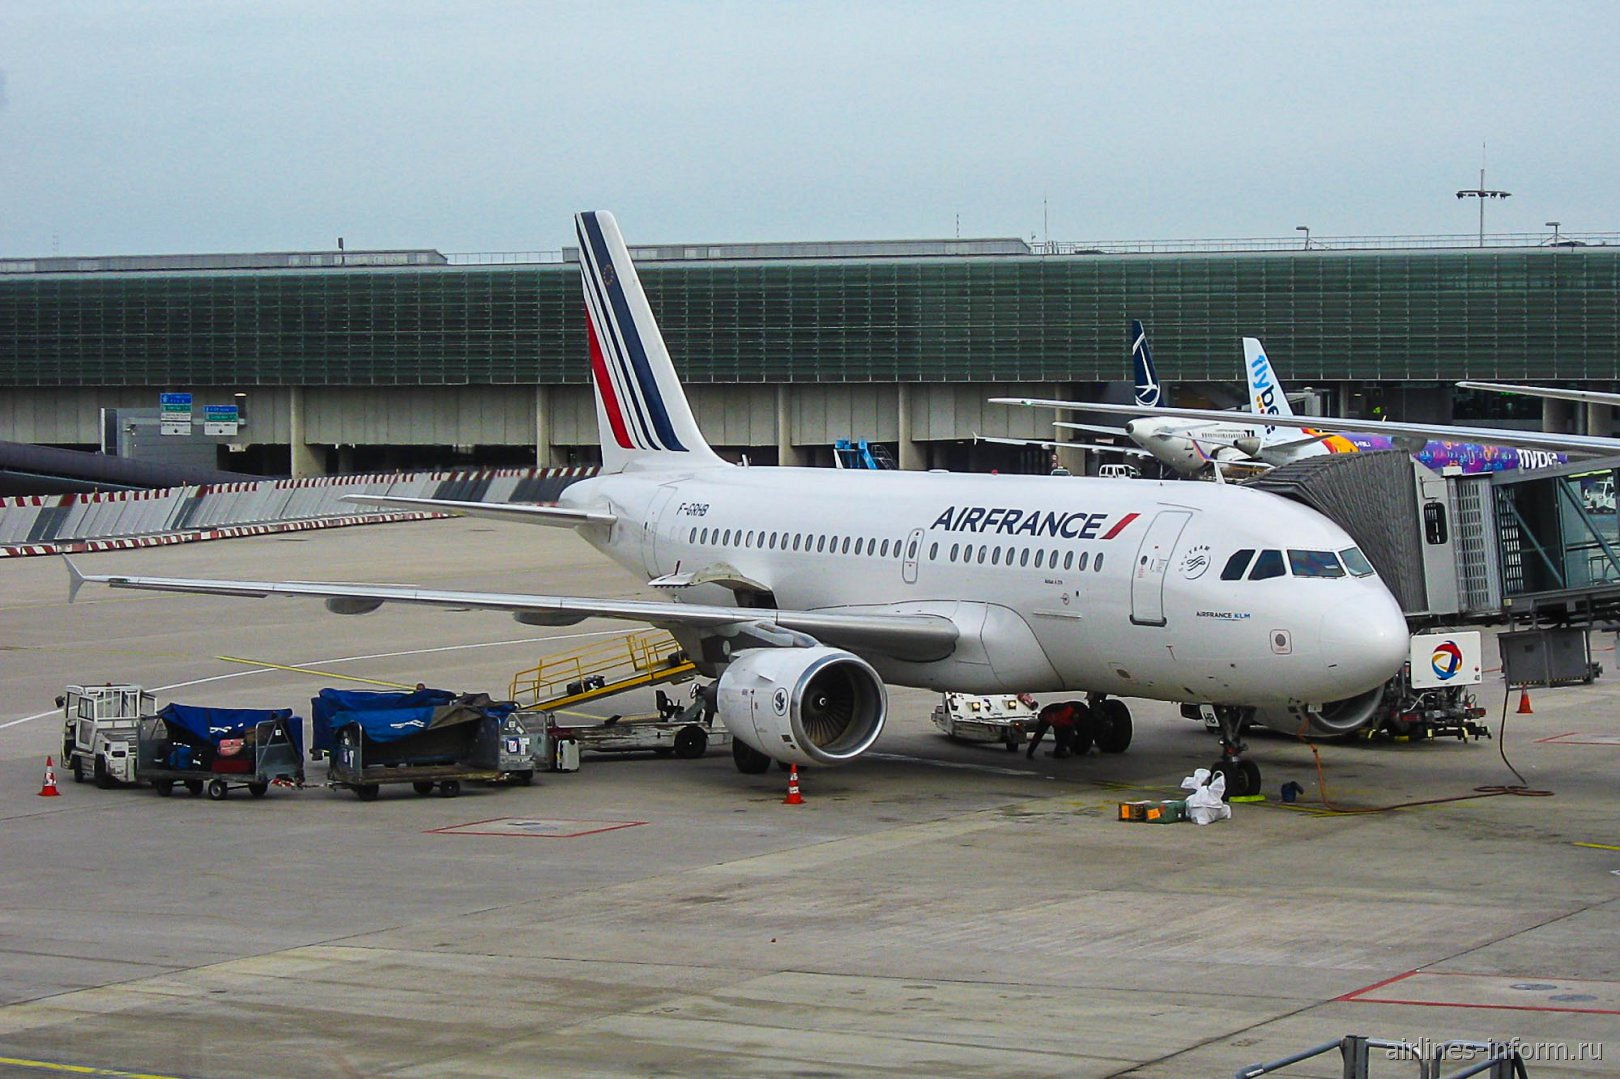 Airbus A319 F-GRHB авиакомпании Air France в аэропорту Париж Шарль-де-Голль